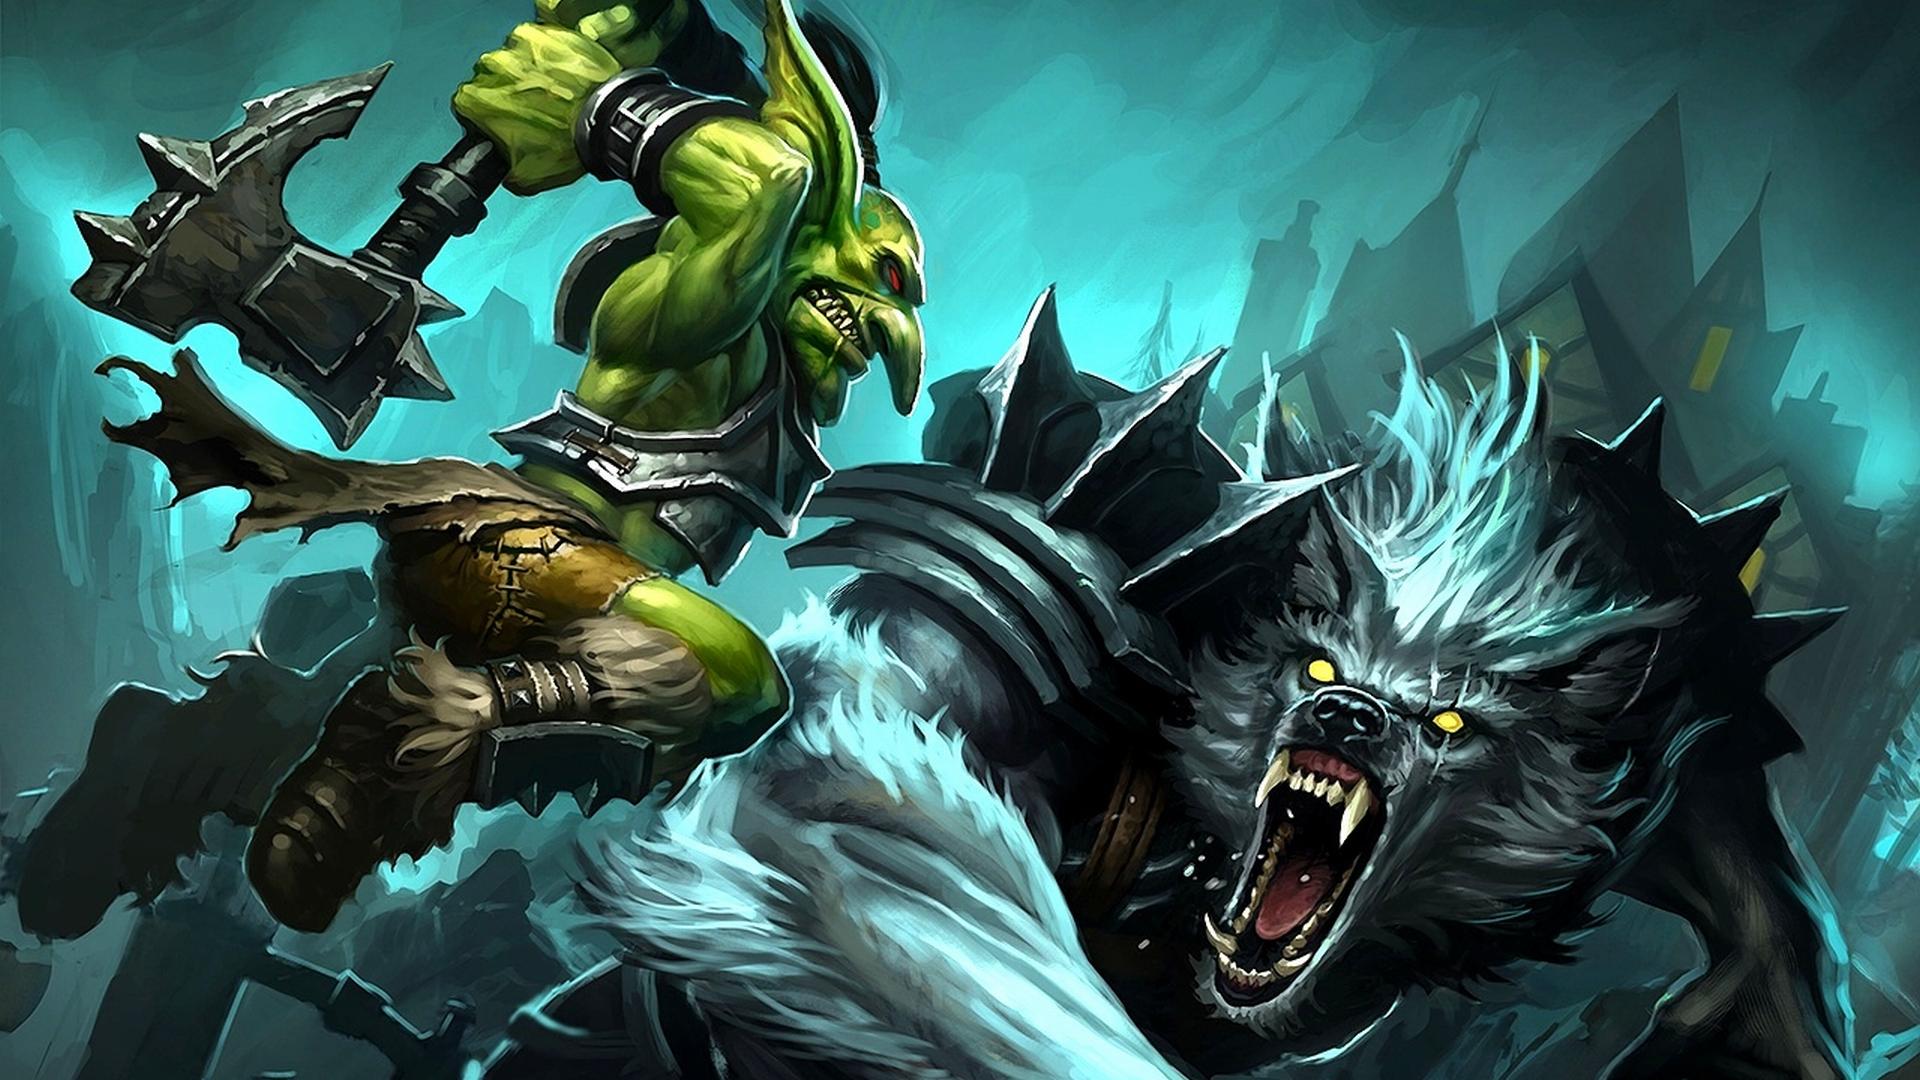 Genji Wallpaper Iphone World Of Warcraft Full Hd Fondo De Pantalla And Fondo De